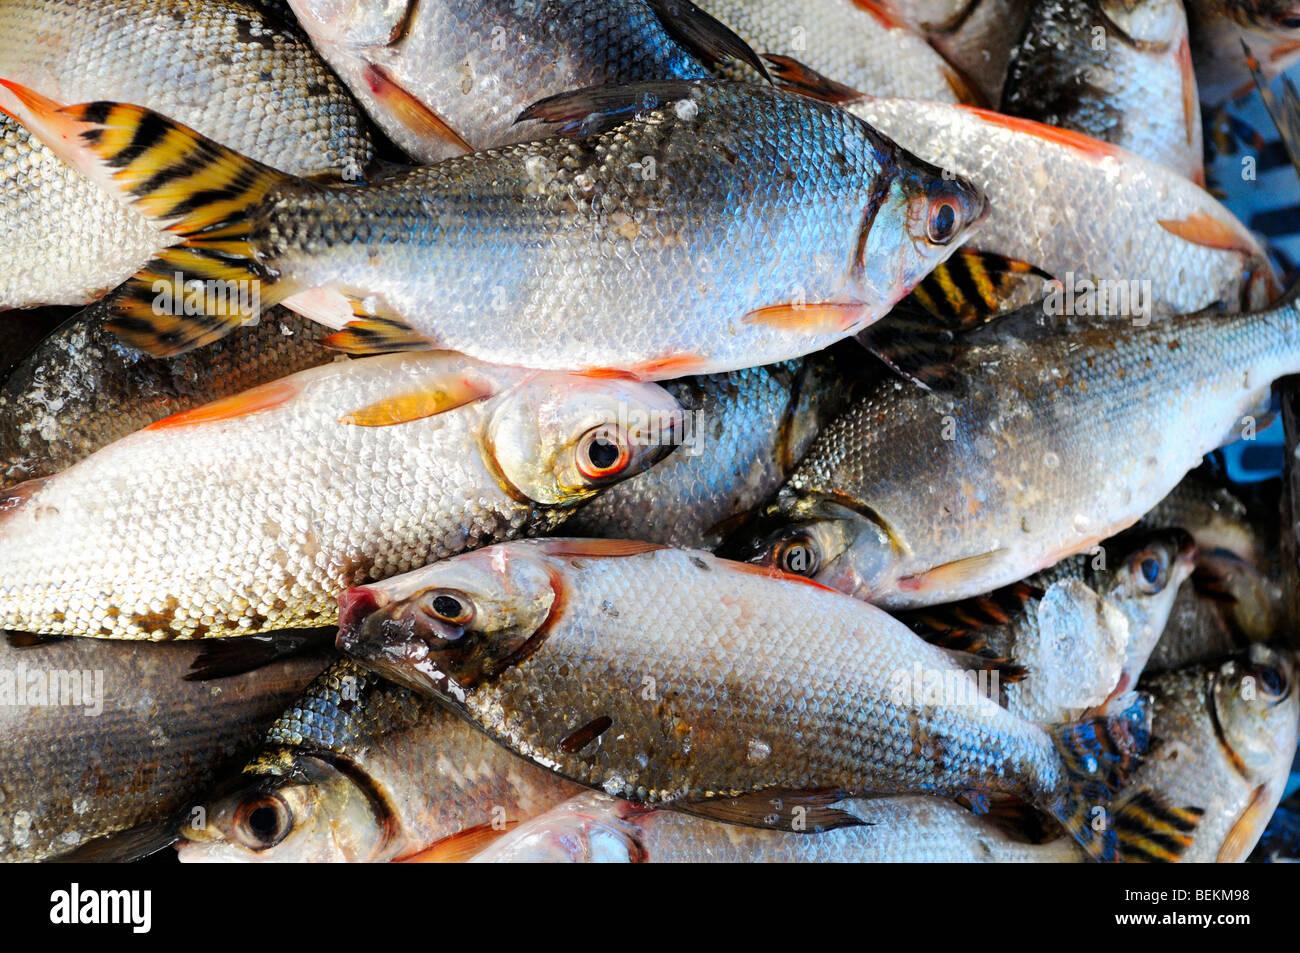 Jaraqui. Amazon region fish. - Stock Image